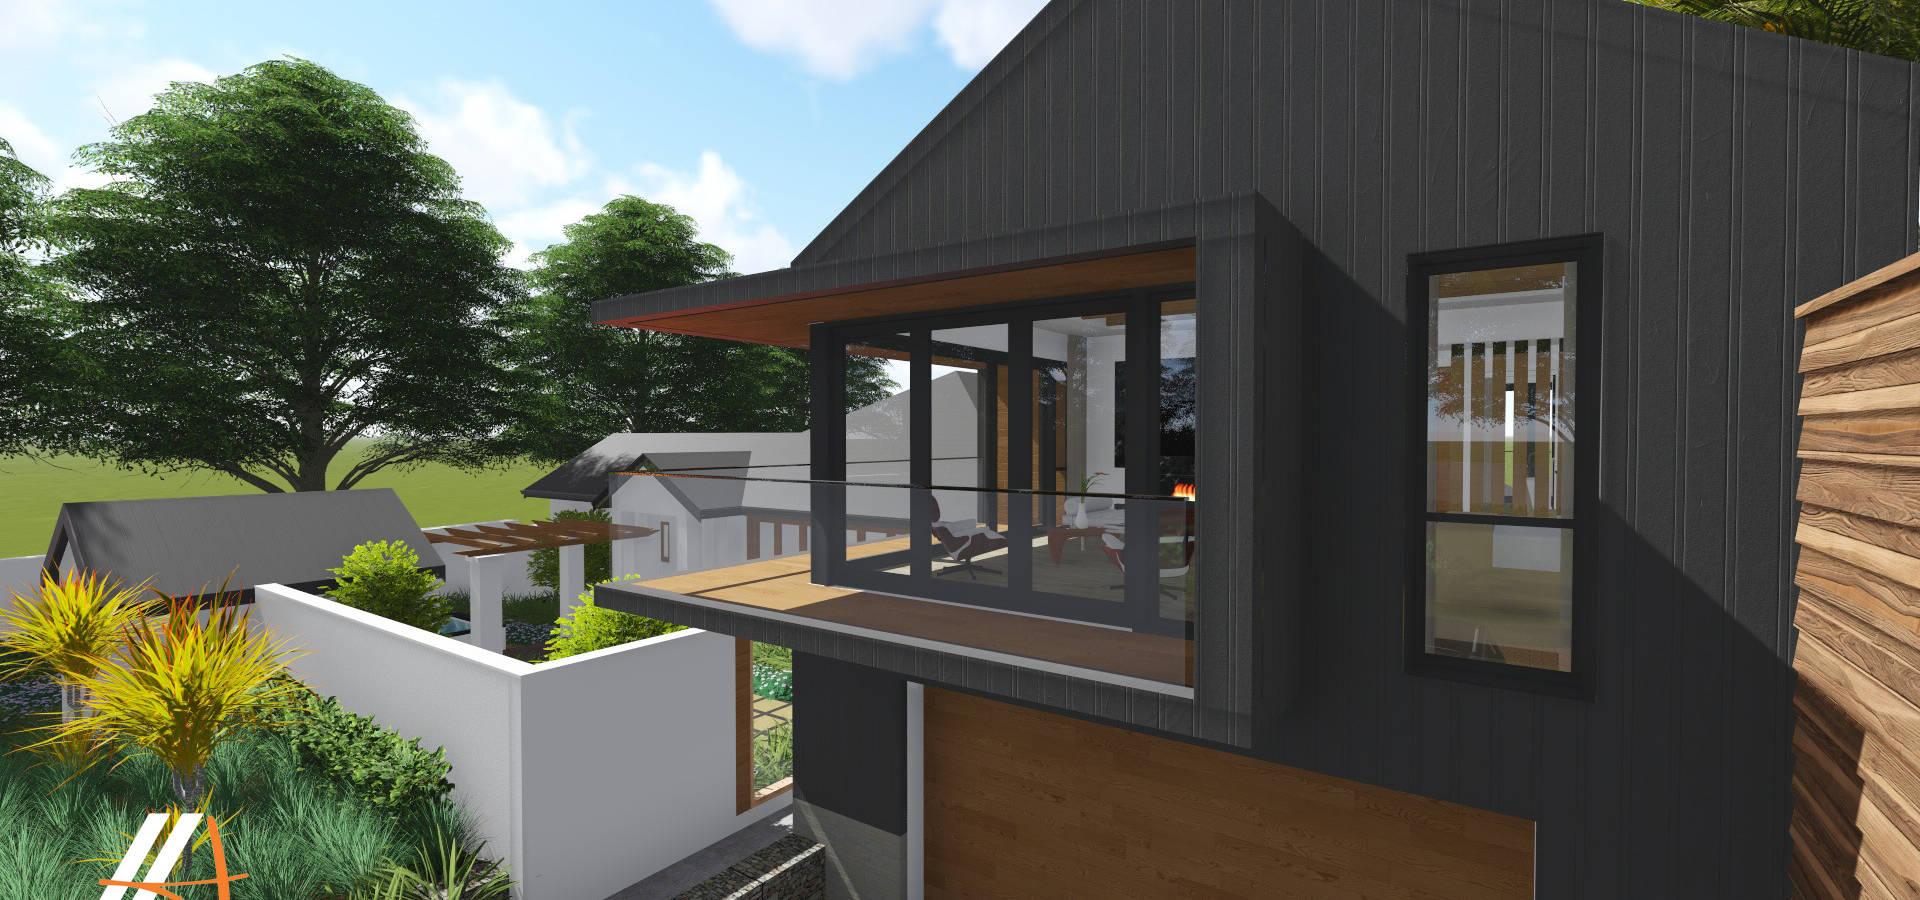 JLA – Jarrod Len Architecture